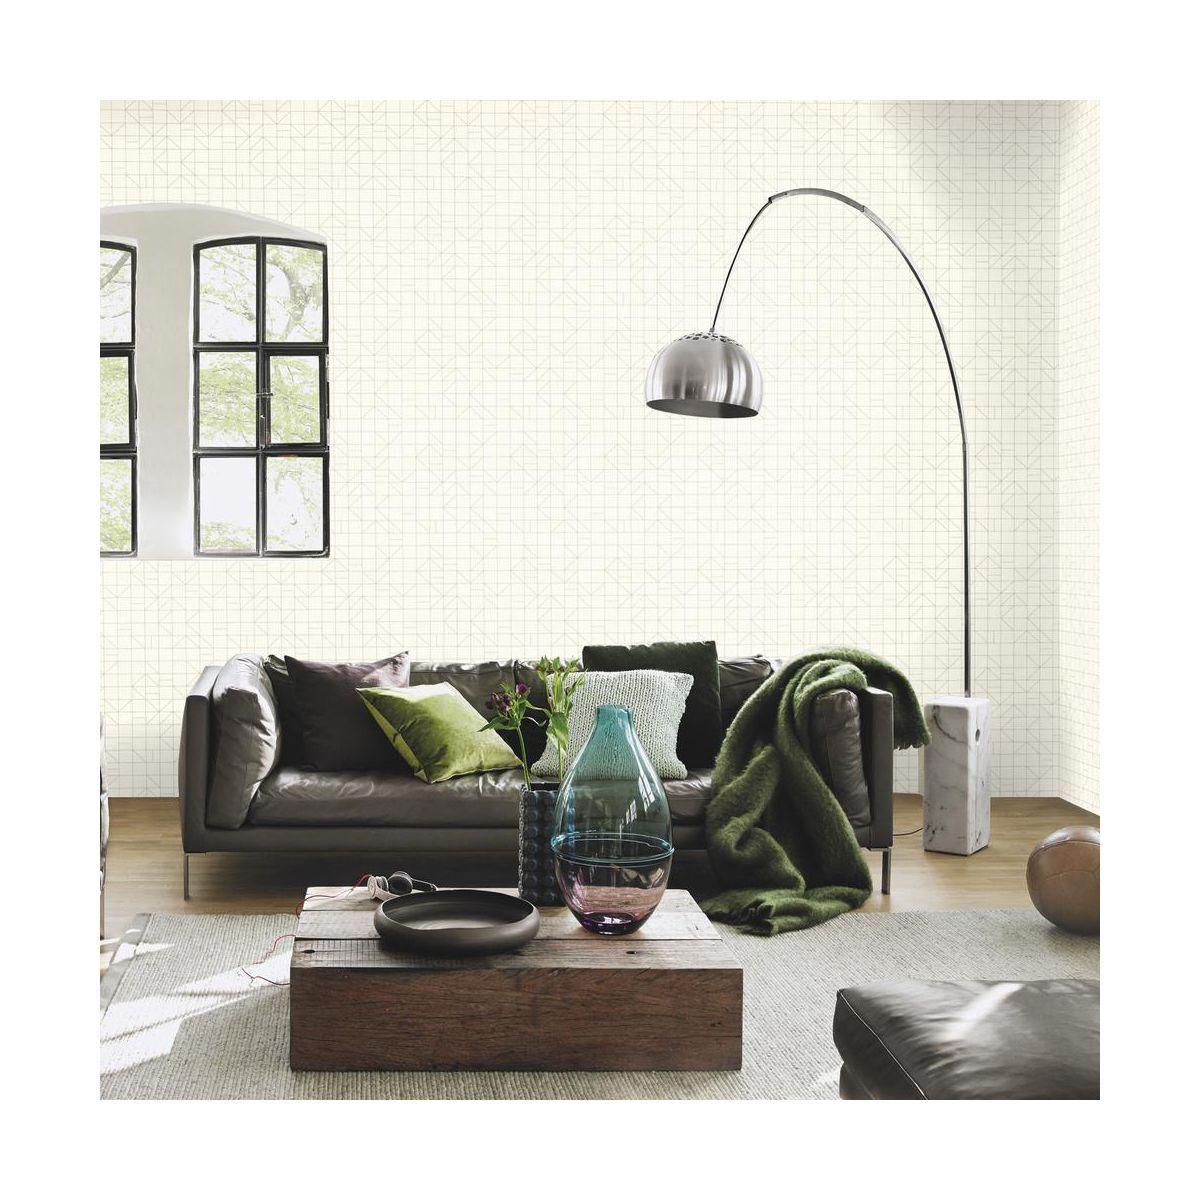 Tapeta Ado Rasch Tapety Na Sciane W Atrakcyjnej Cenie W Sklepach Leroy Merlin Home Decor Furniture Decor